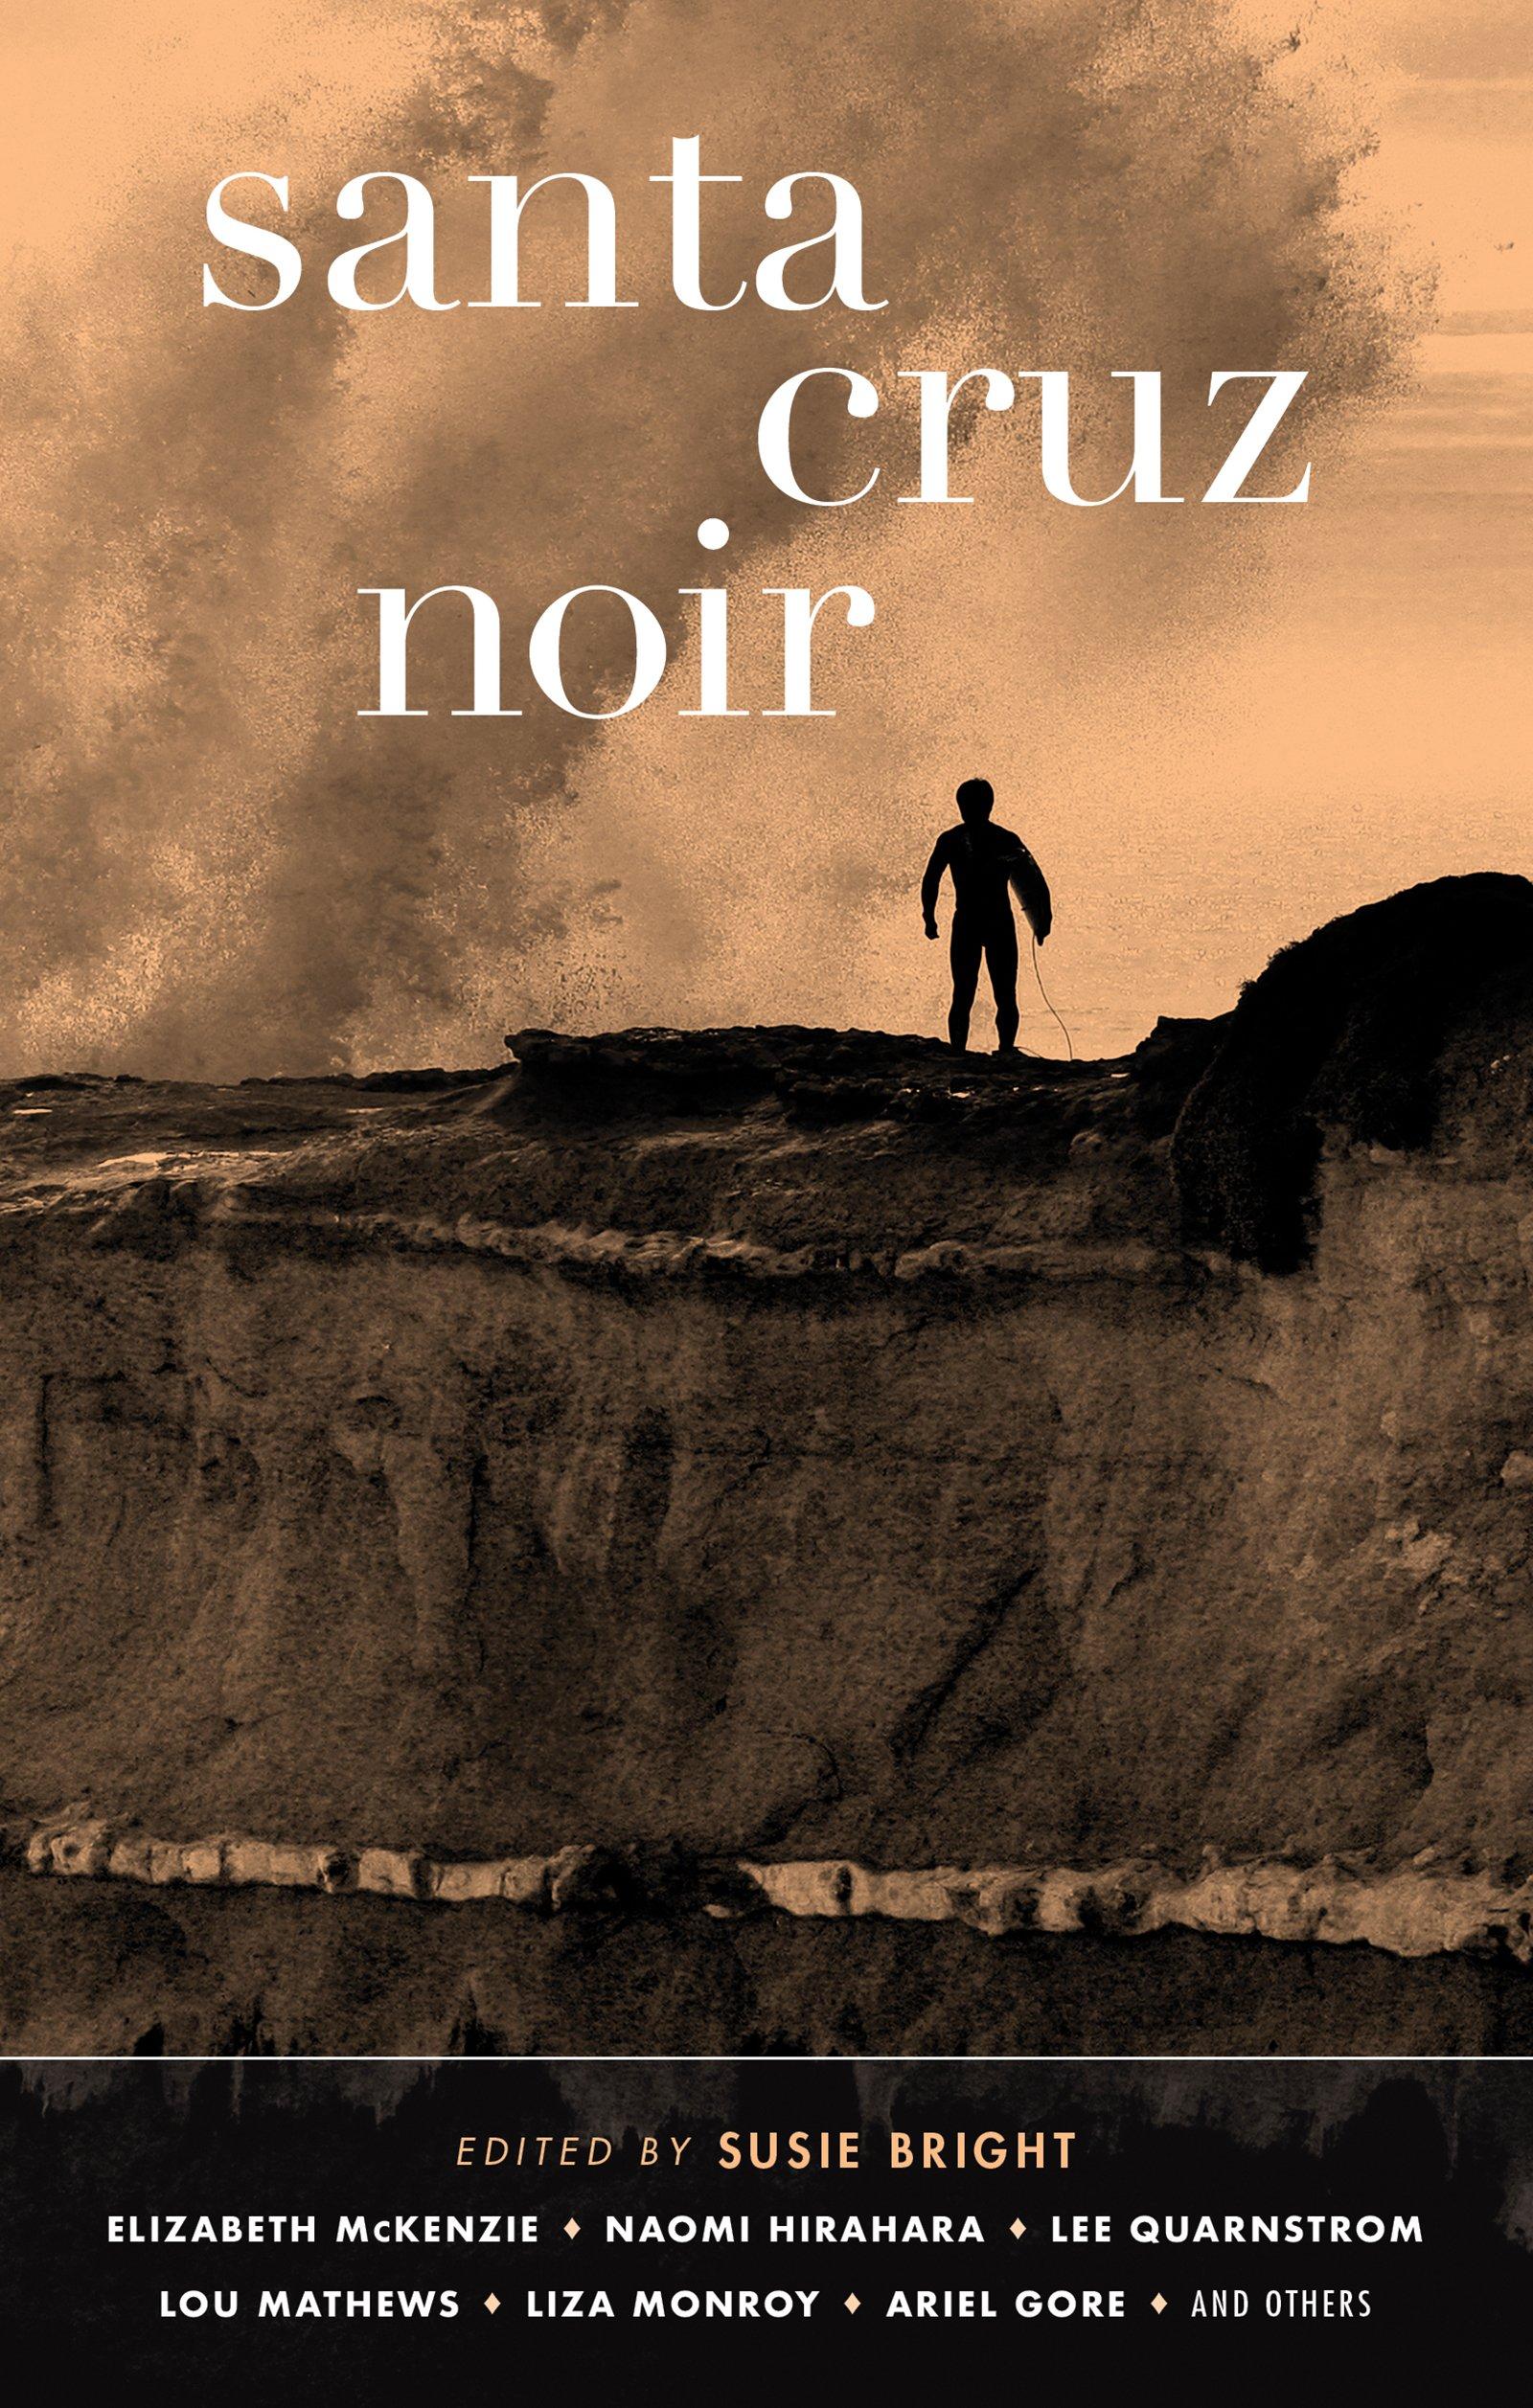 Santa Cruz Noir (Akashic Noir Series): Susie Bright: 9781617756221